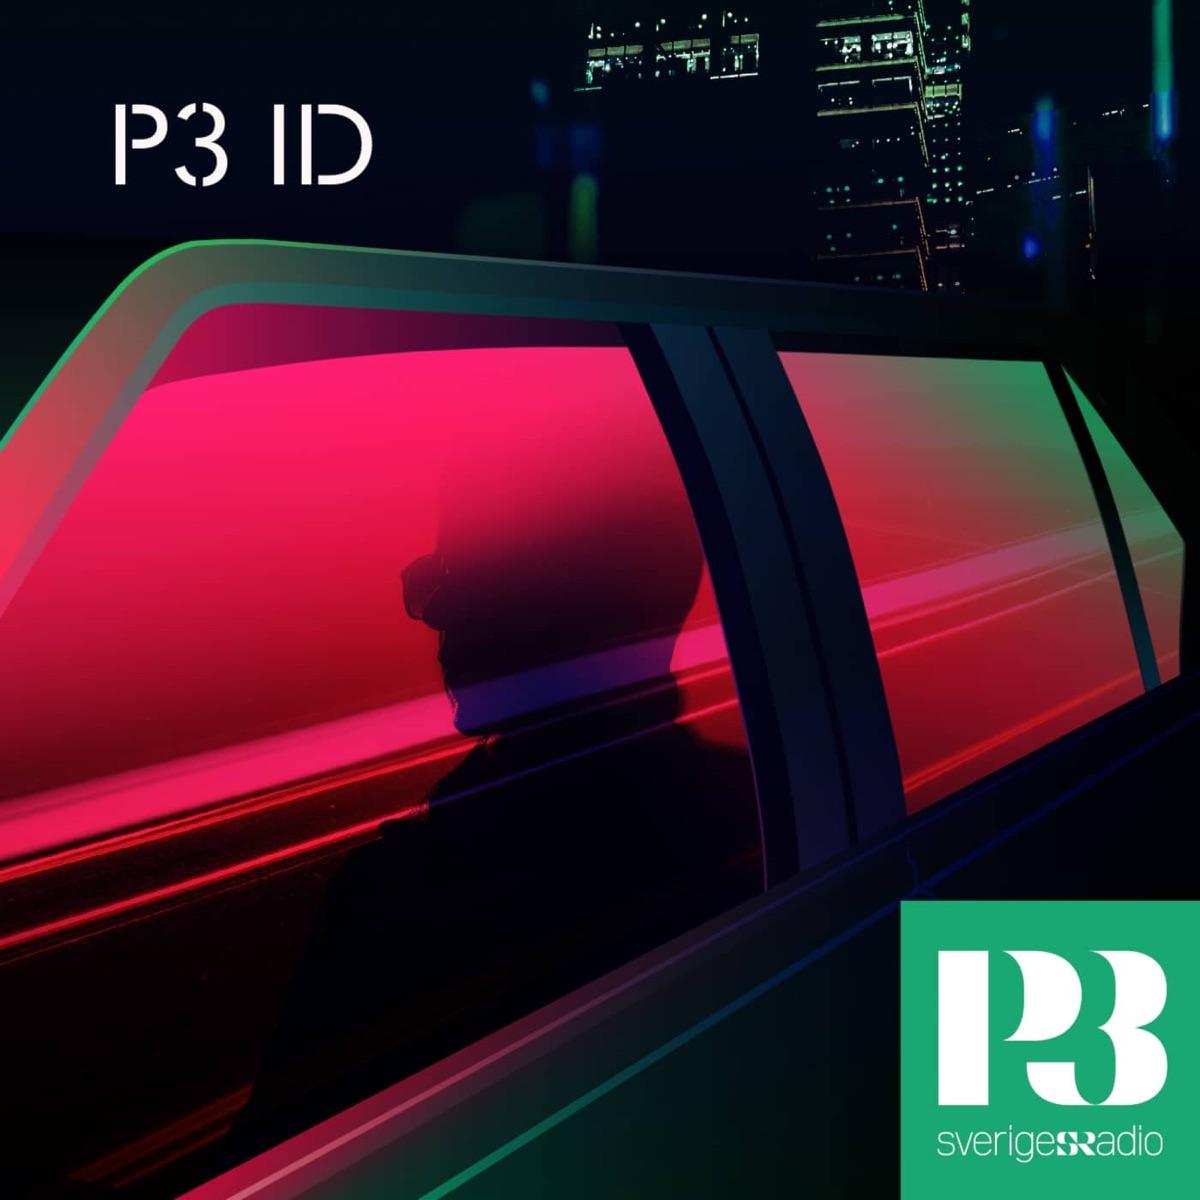 P3 ID